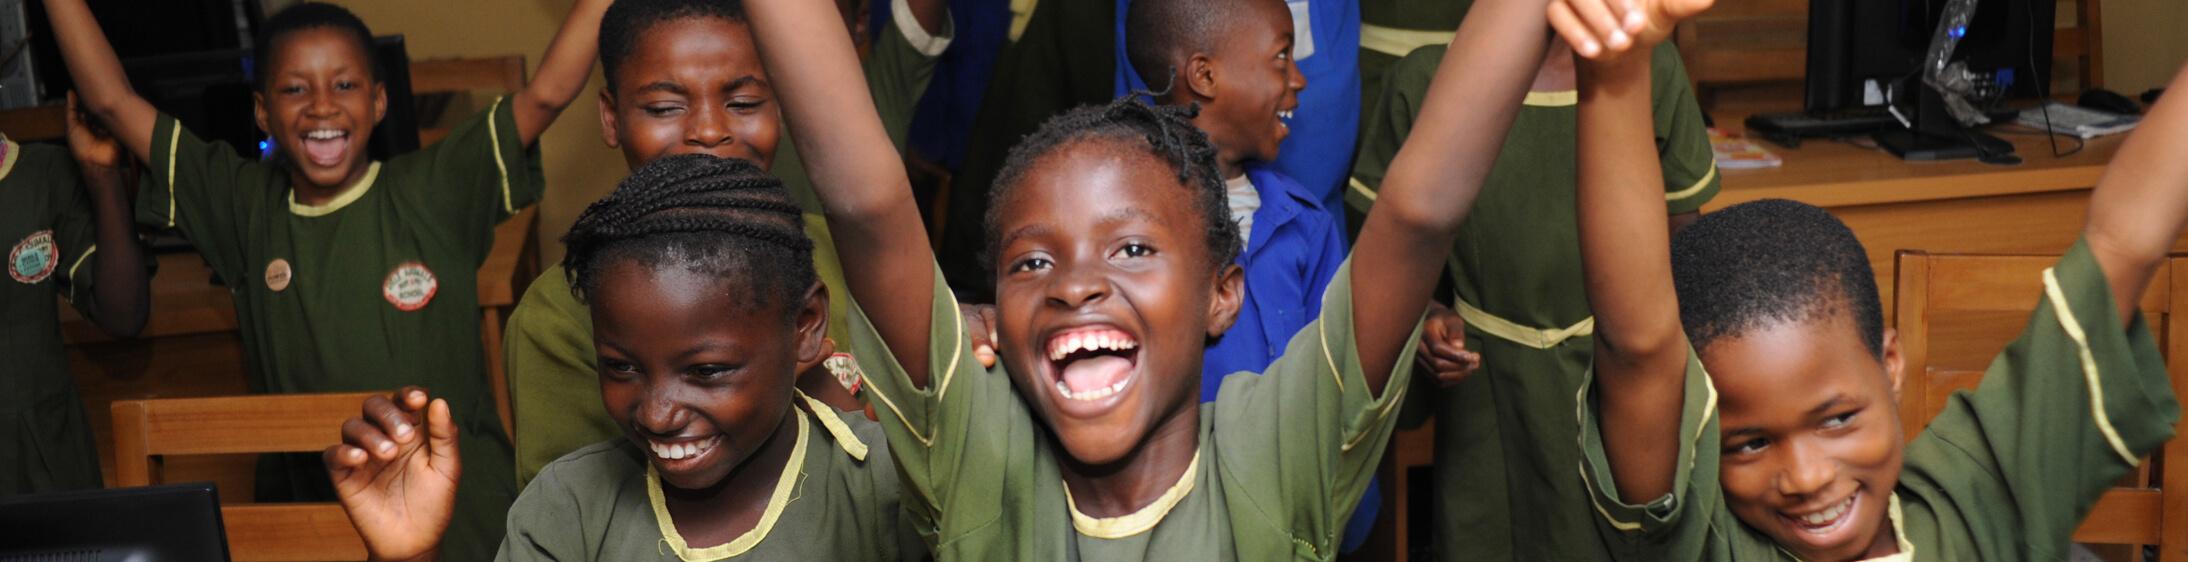 African children holding hands in classroom.